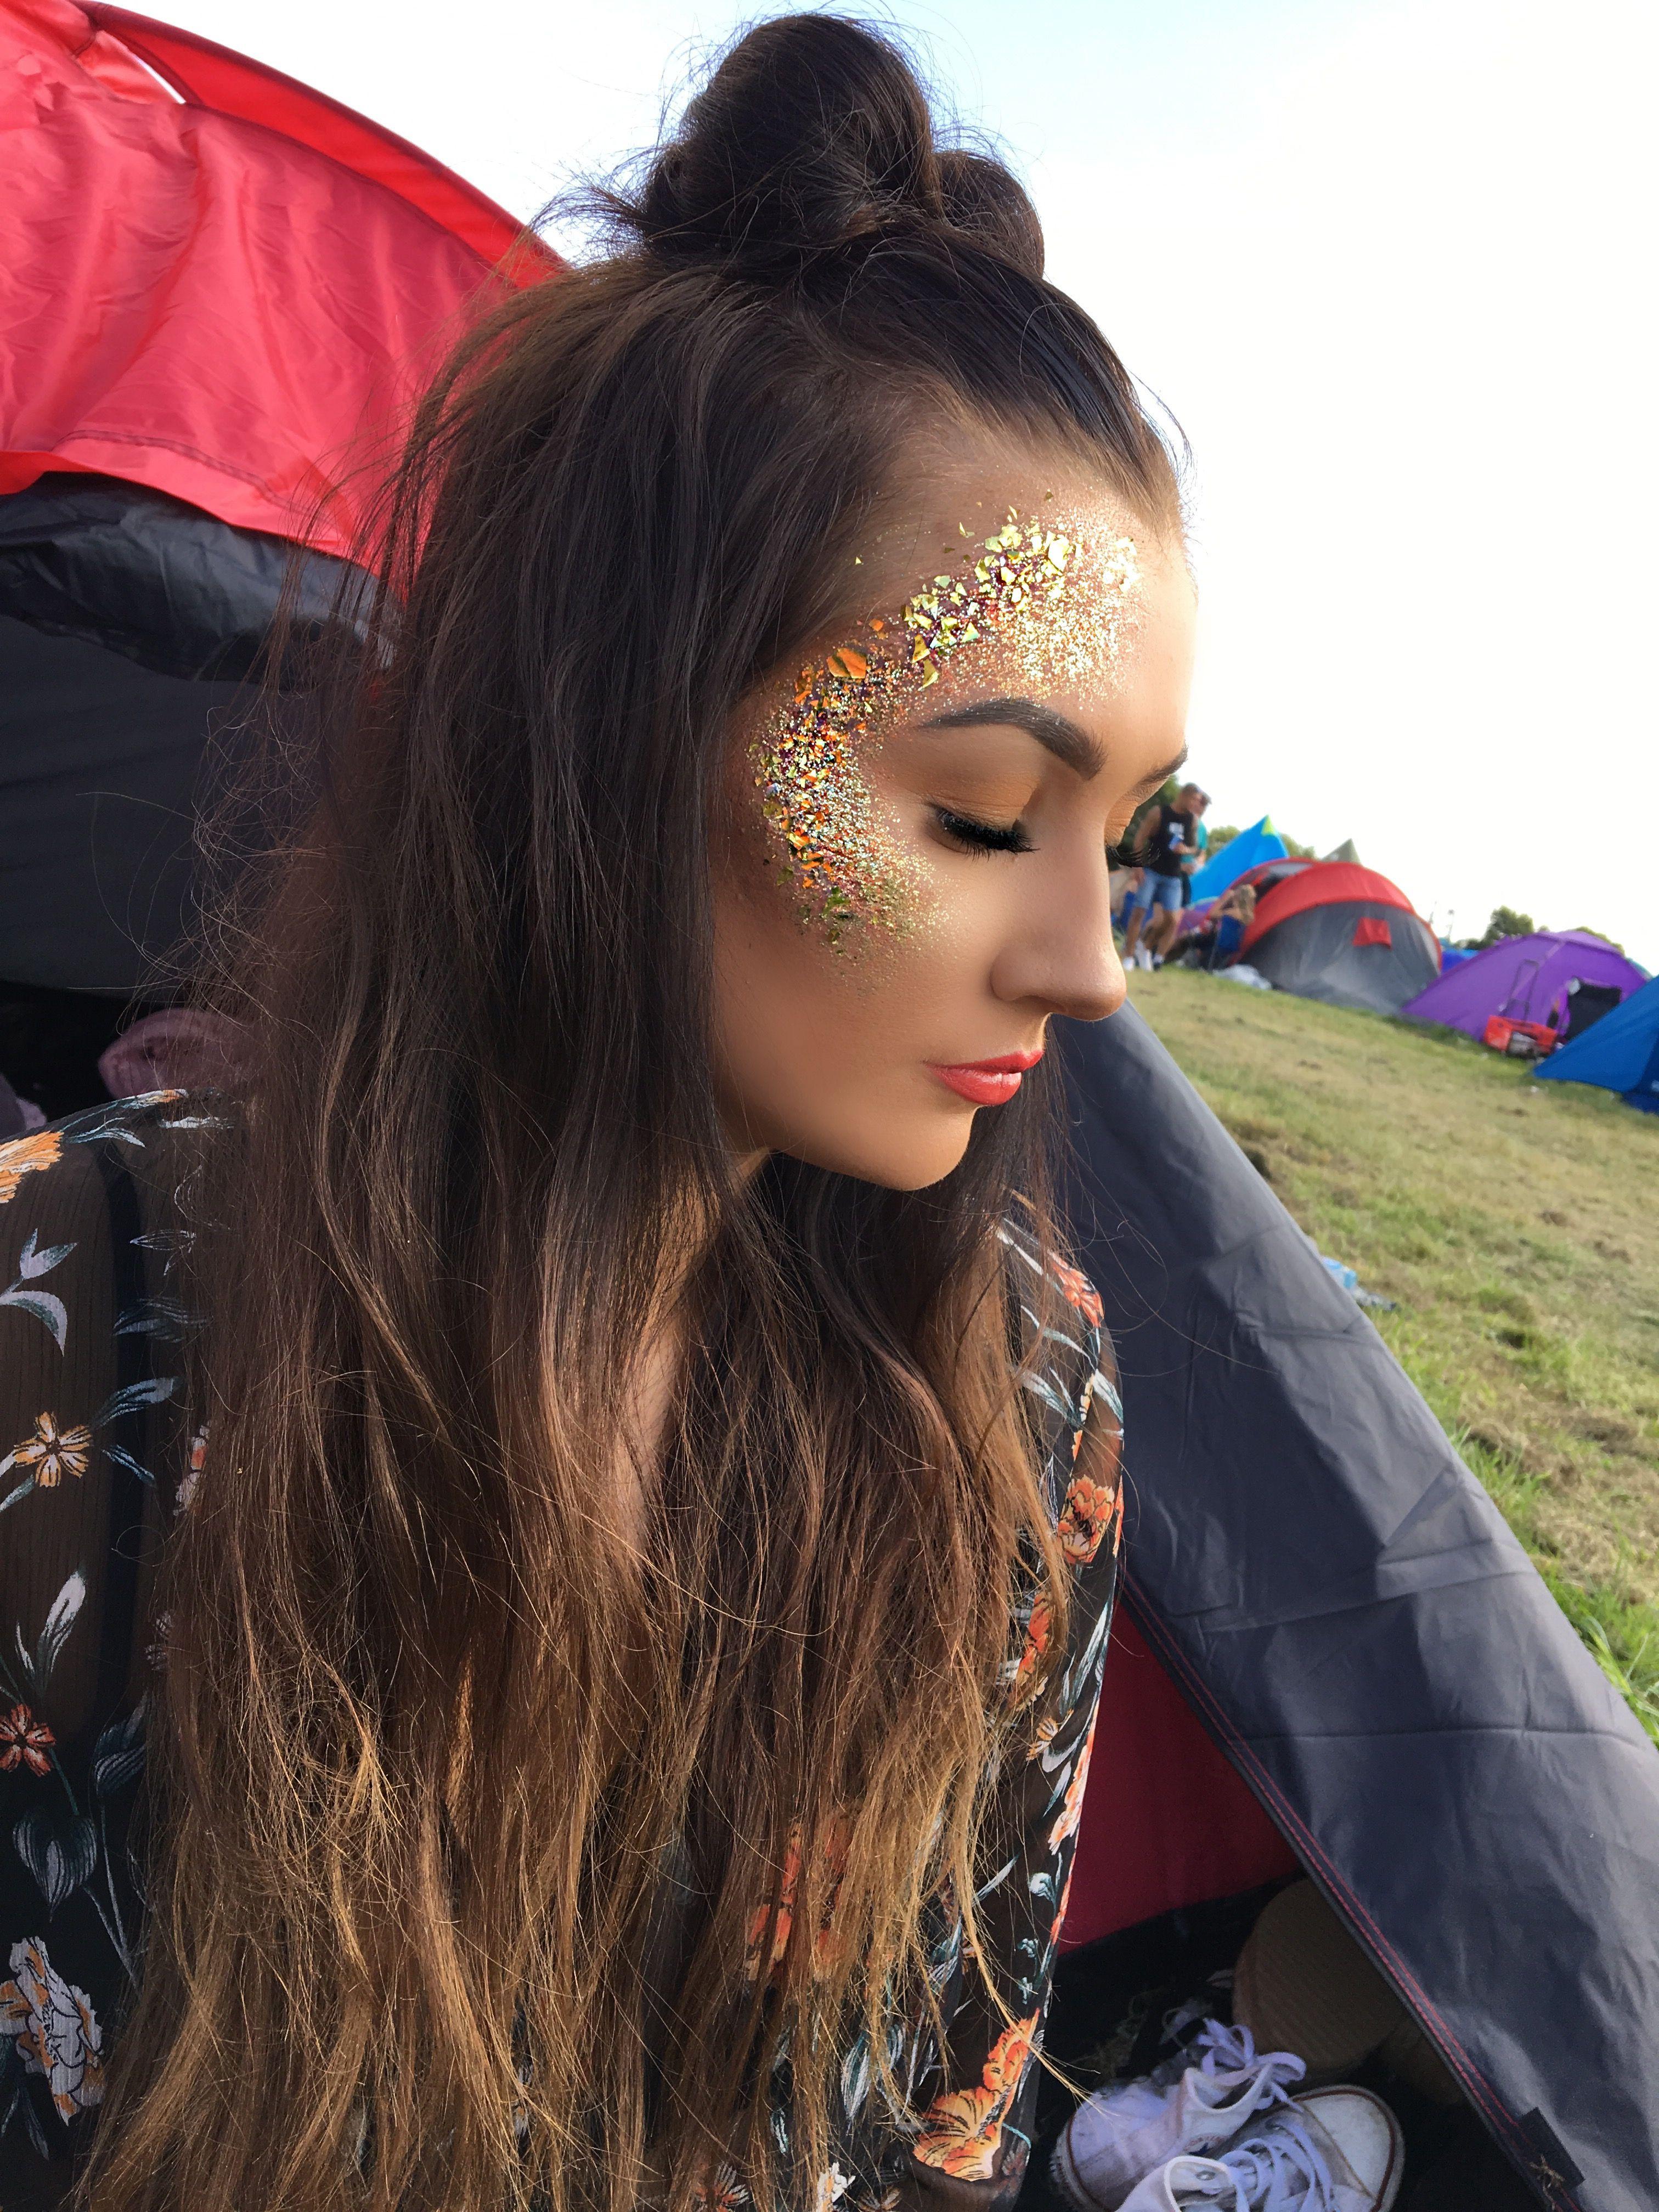 Glitter Festival Creamfields Space Buns Festival Makeup Outfits